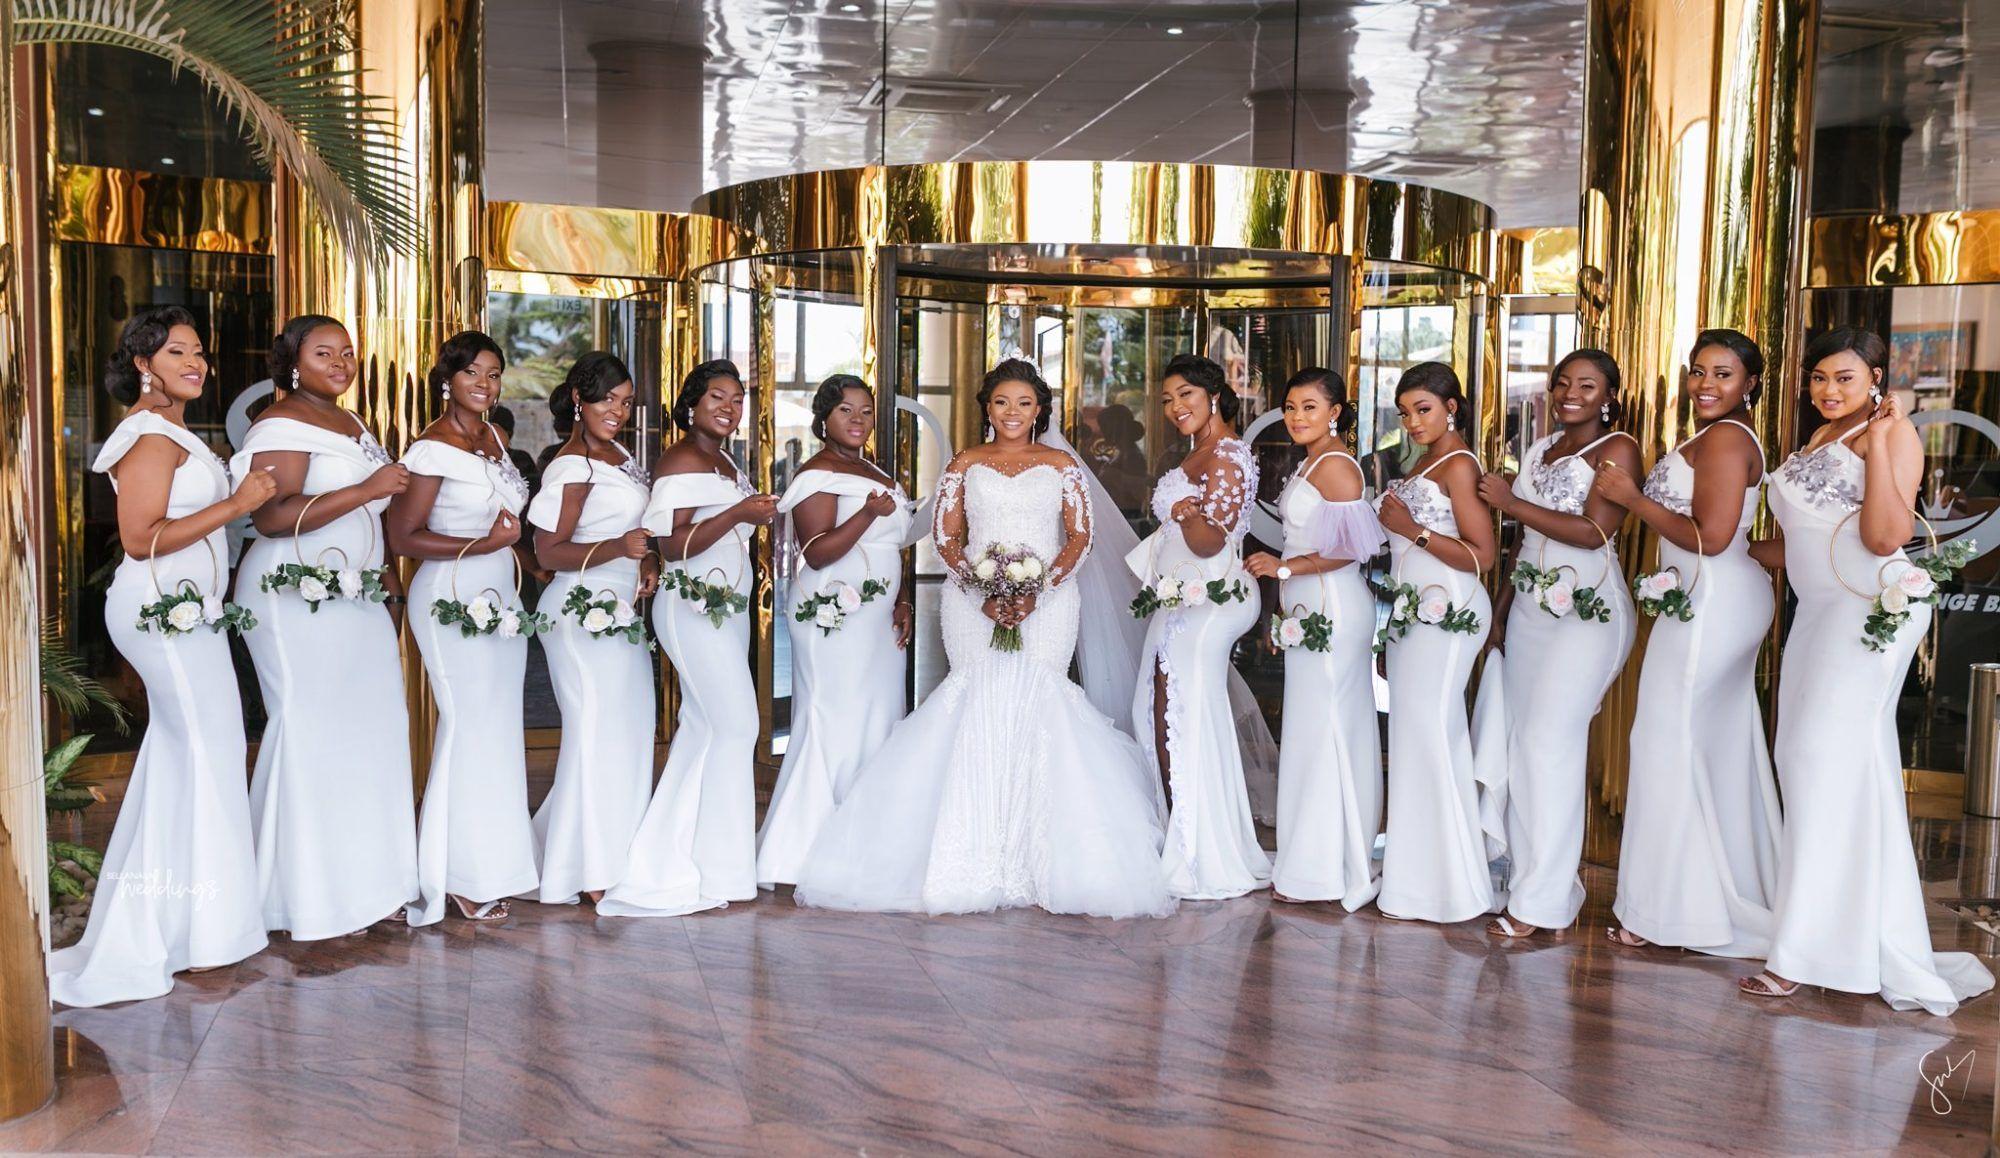 Loretta And Josh S White Wedding In Ghana Will Captivate You Easily Lovely Wedding Dress Girls Bridesmaid Dresses African Wedding Dress